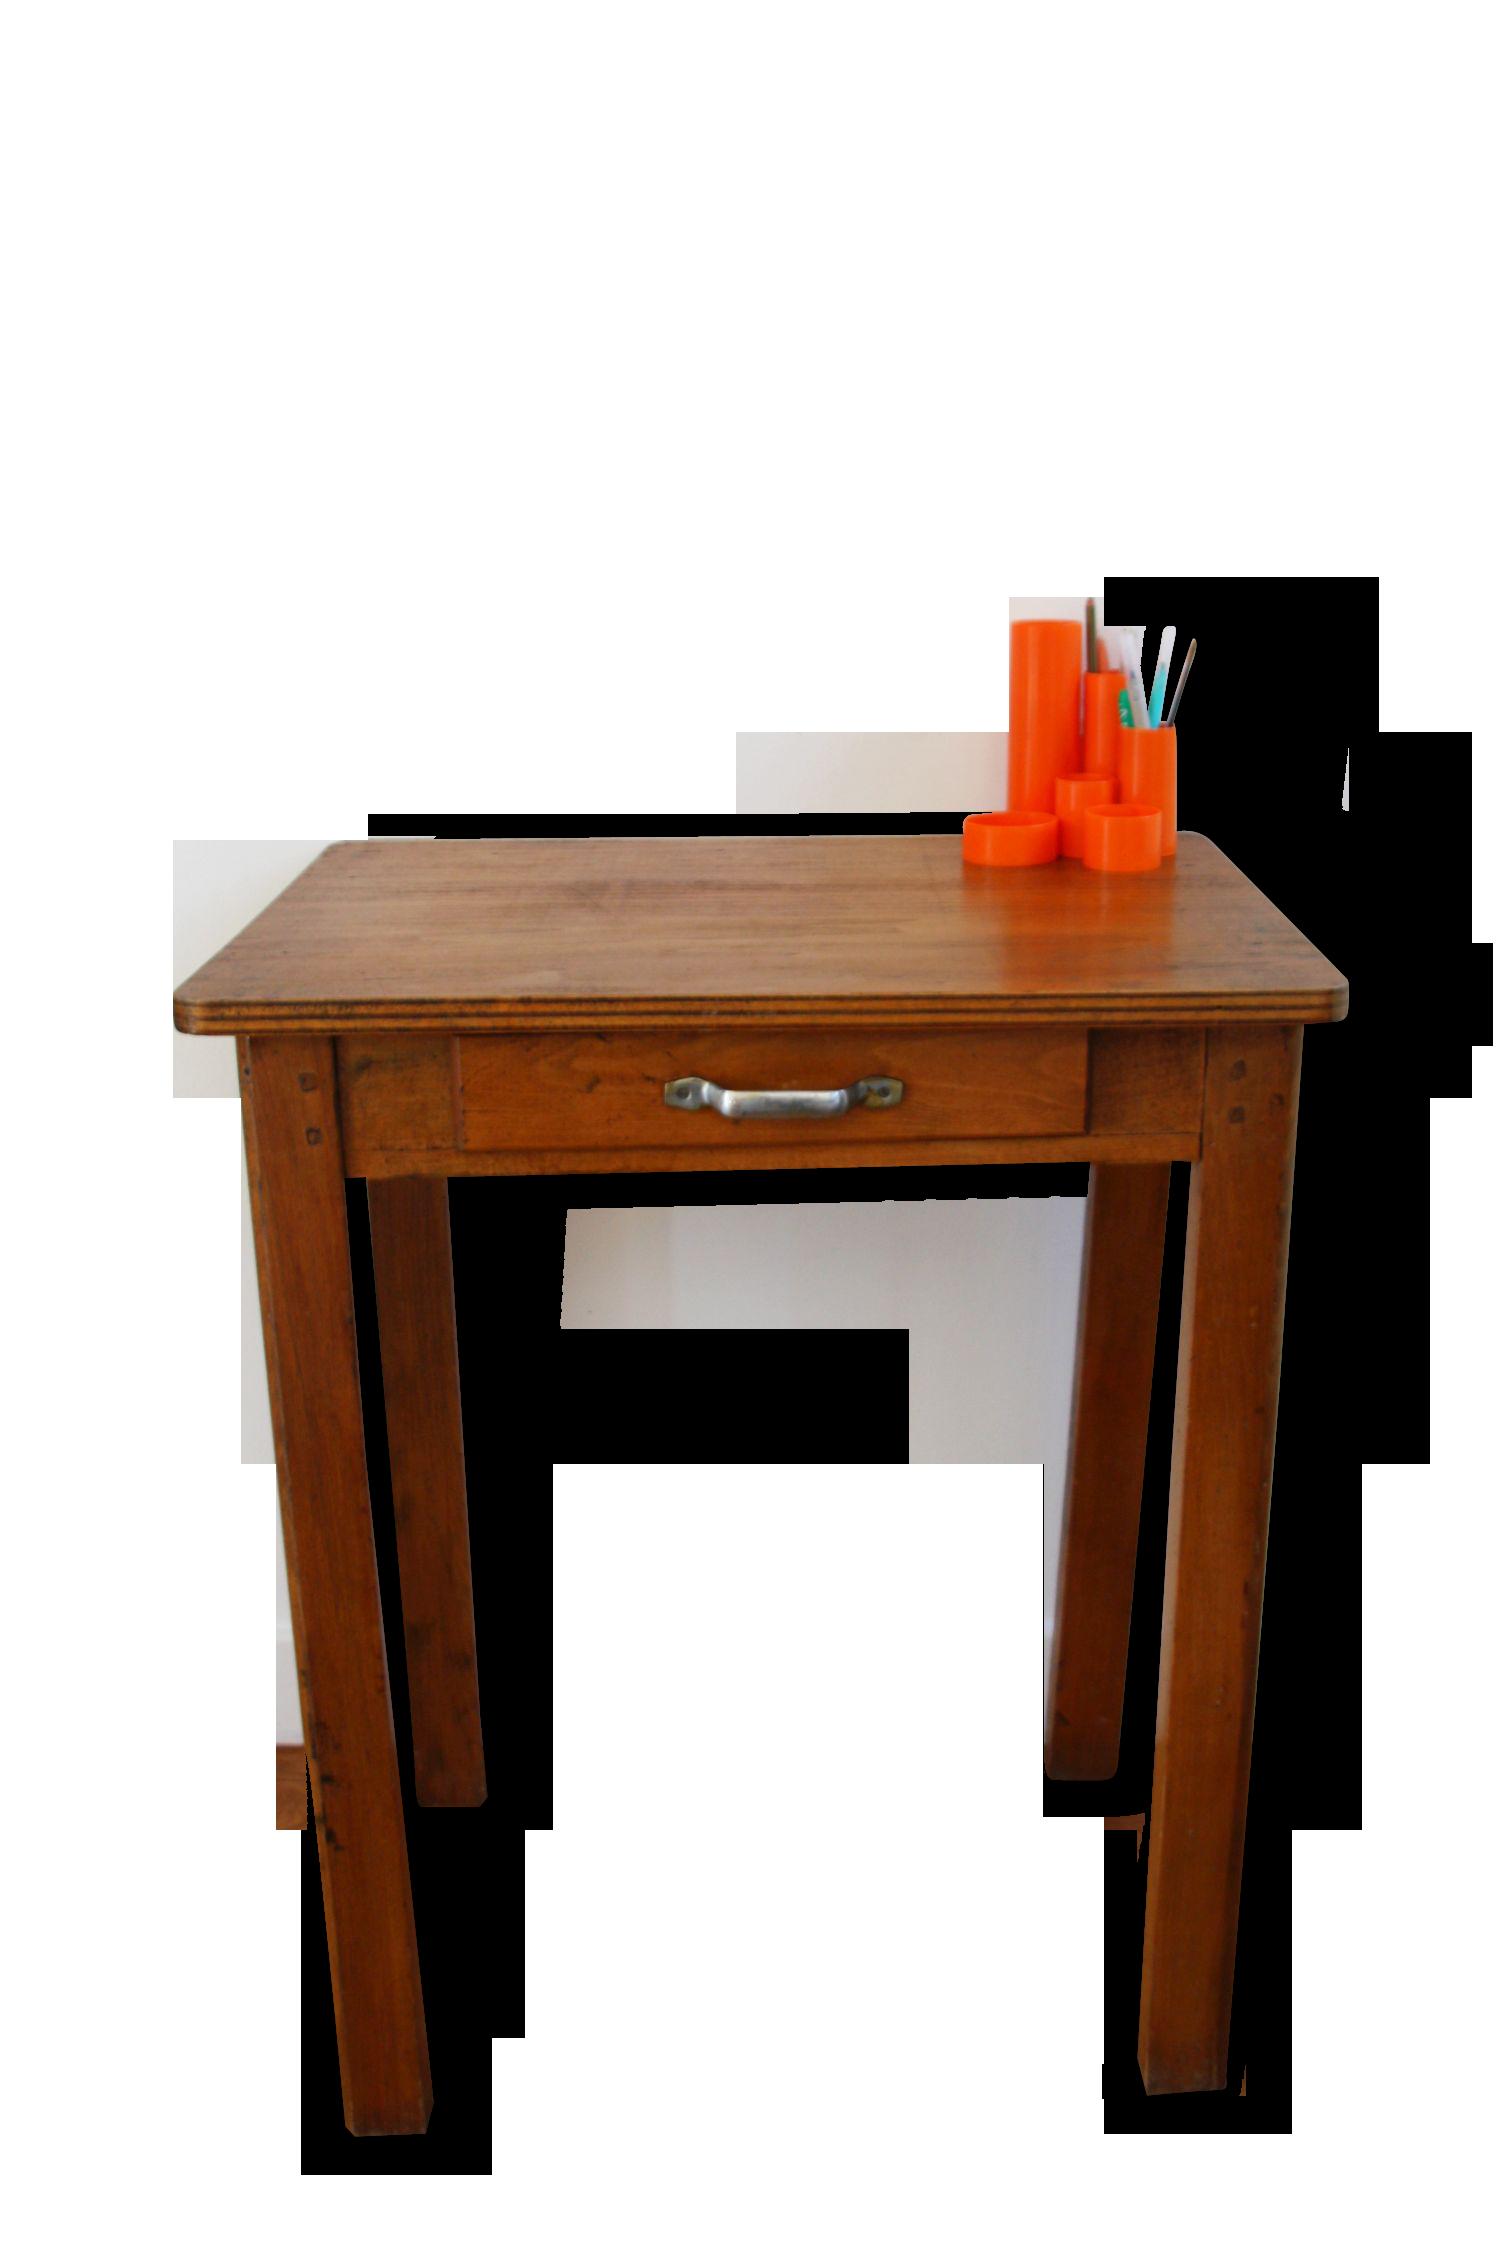 Ancienne petite table bureau dappoint bois Matriau marron